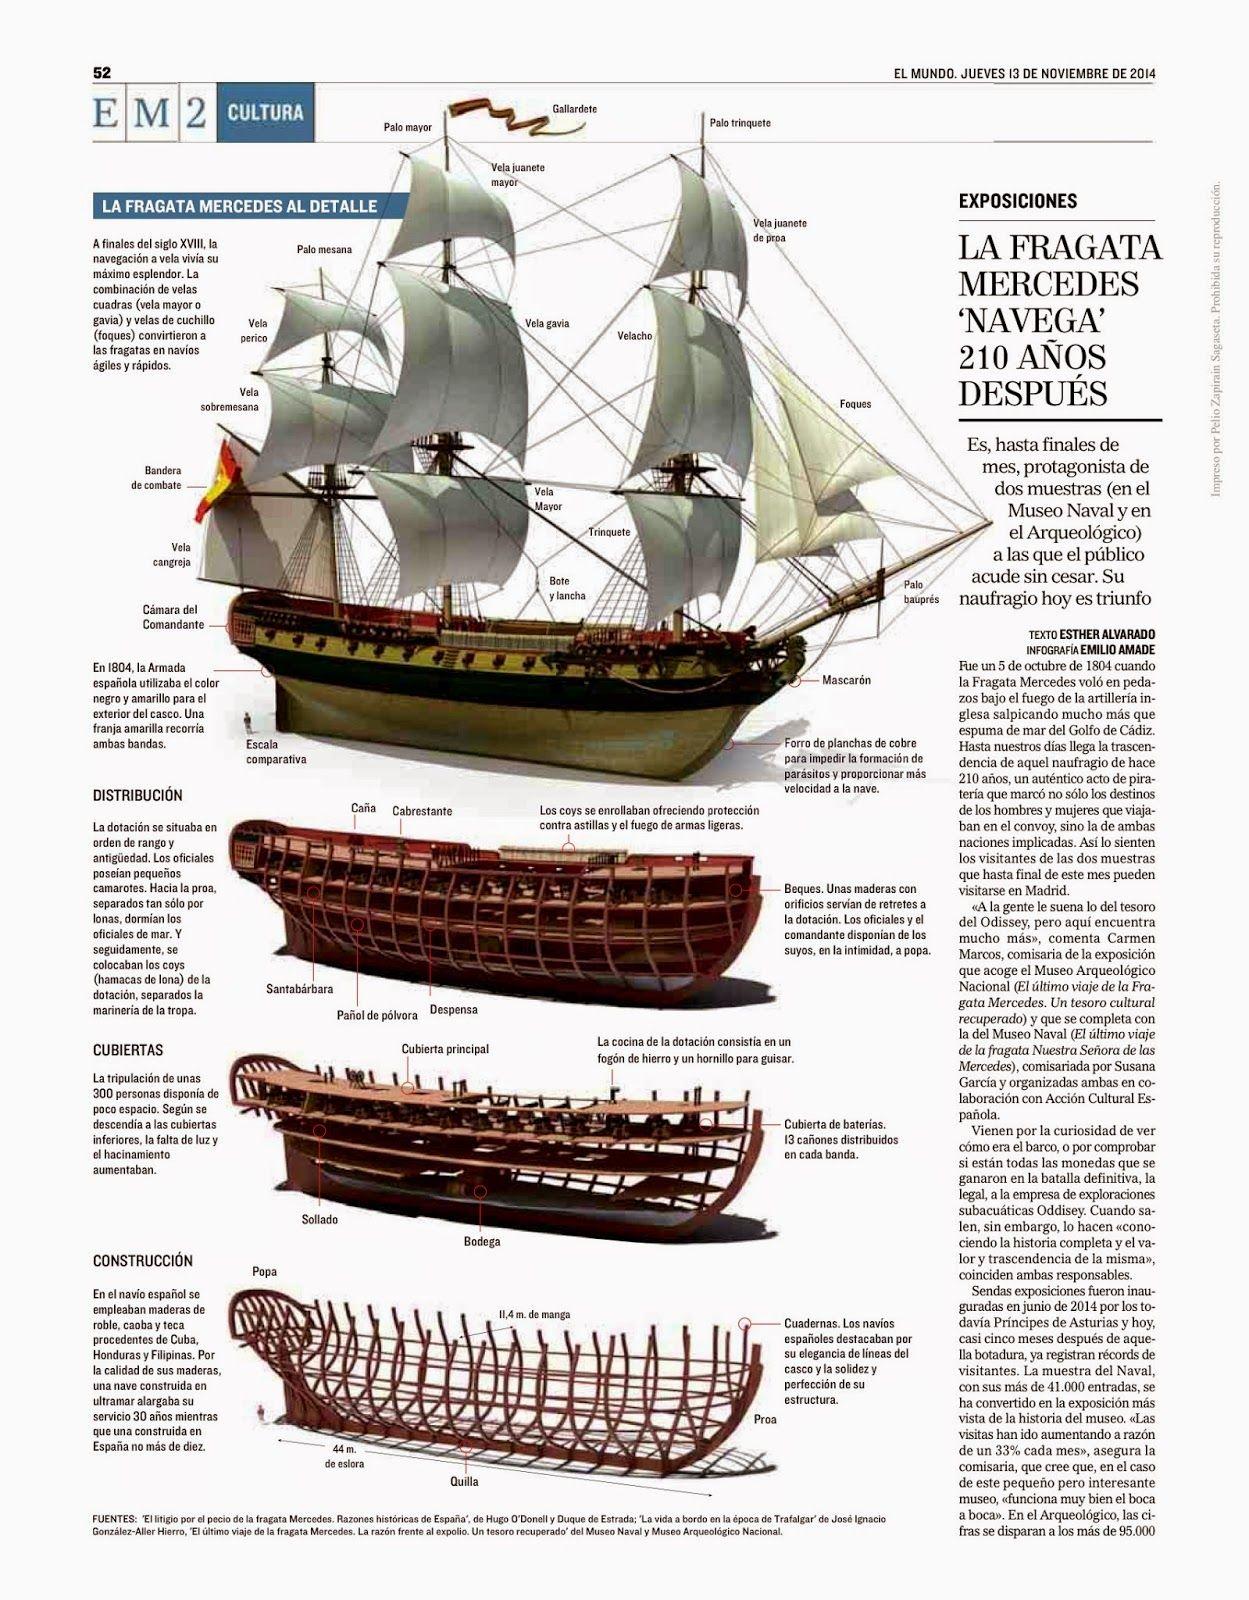 Pin by Alets Klamroth on Infografia | Pinterest | Infographics